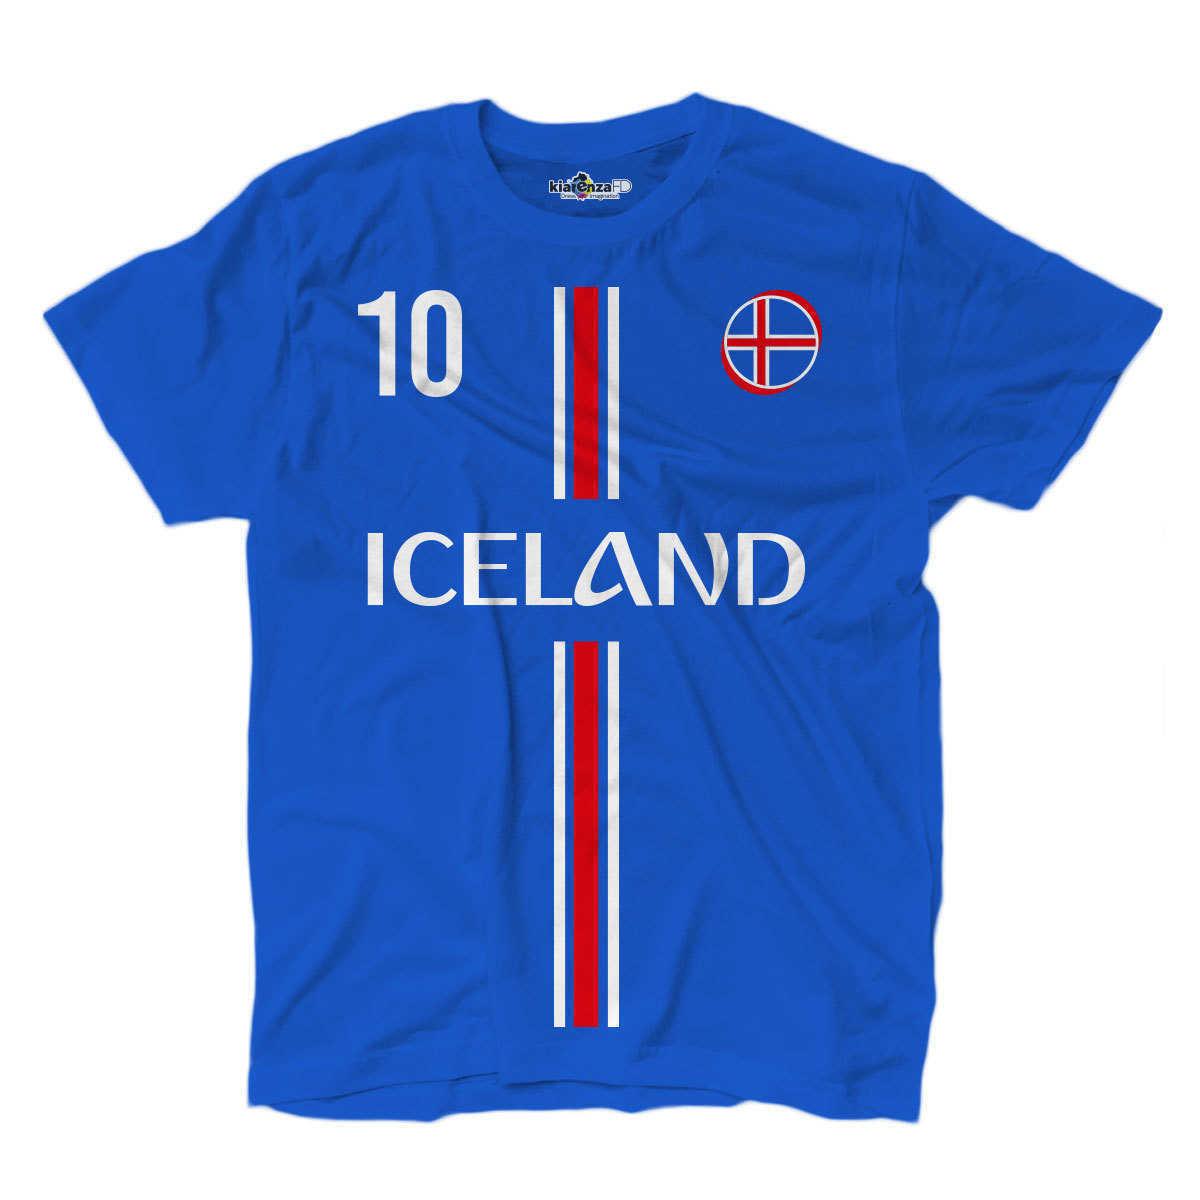 Camiseta de fútbol nacional Gylfi sigurdson Island 10 S Azul Real